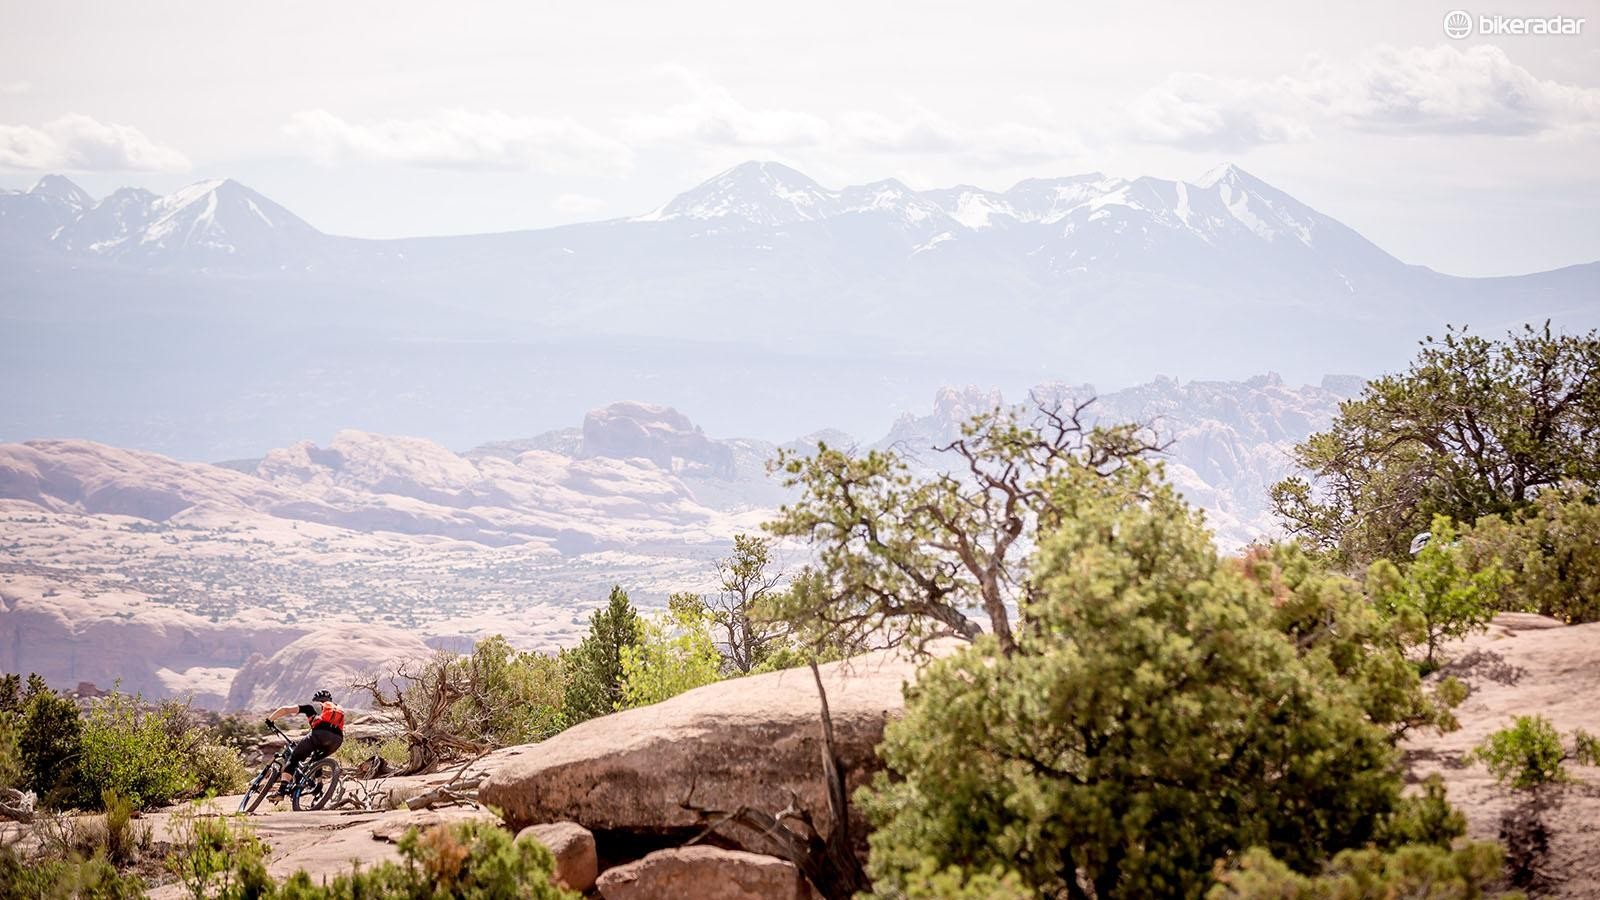 It's hard to take in Moab's stunning views while dodging rocks...